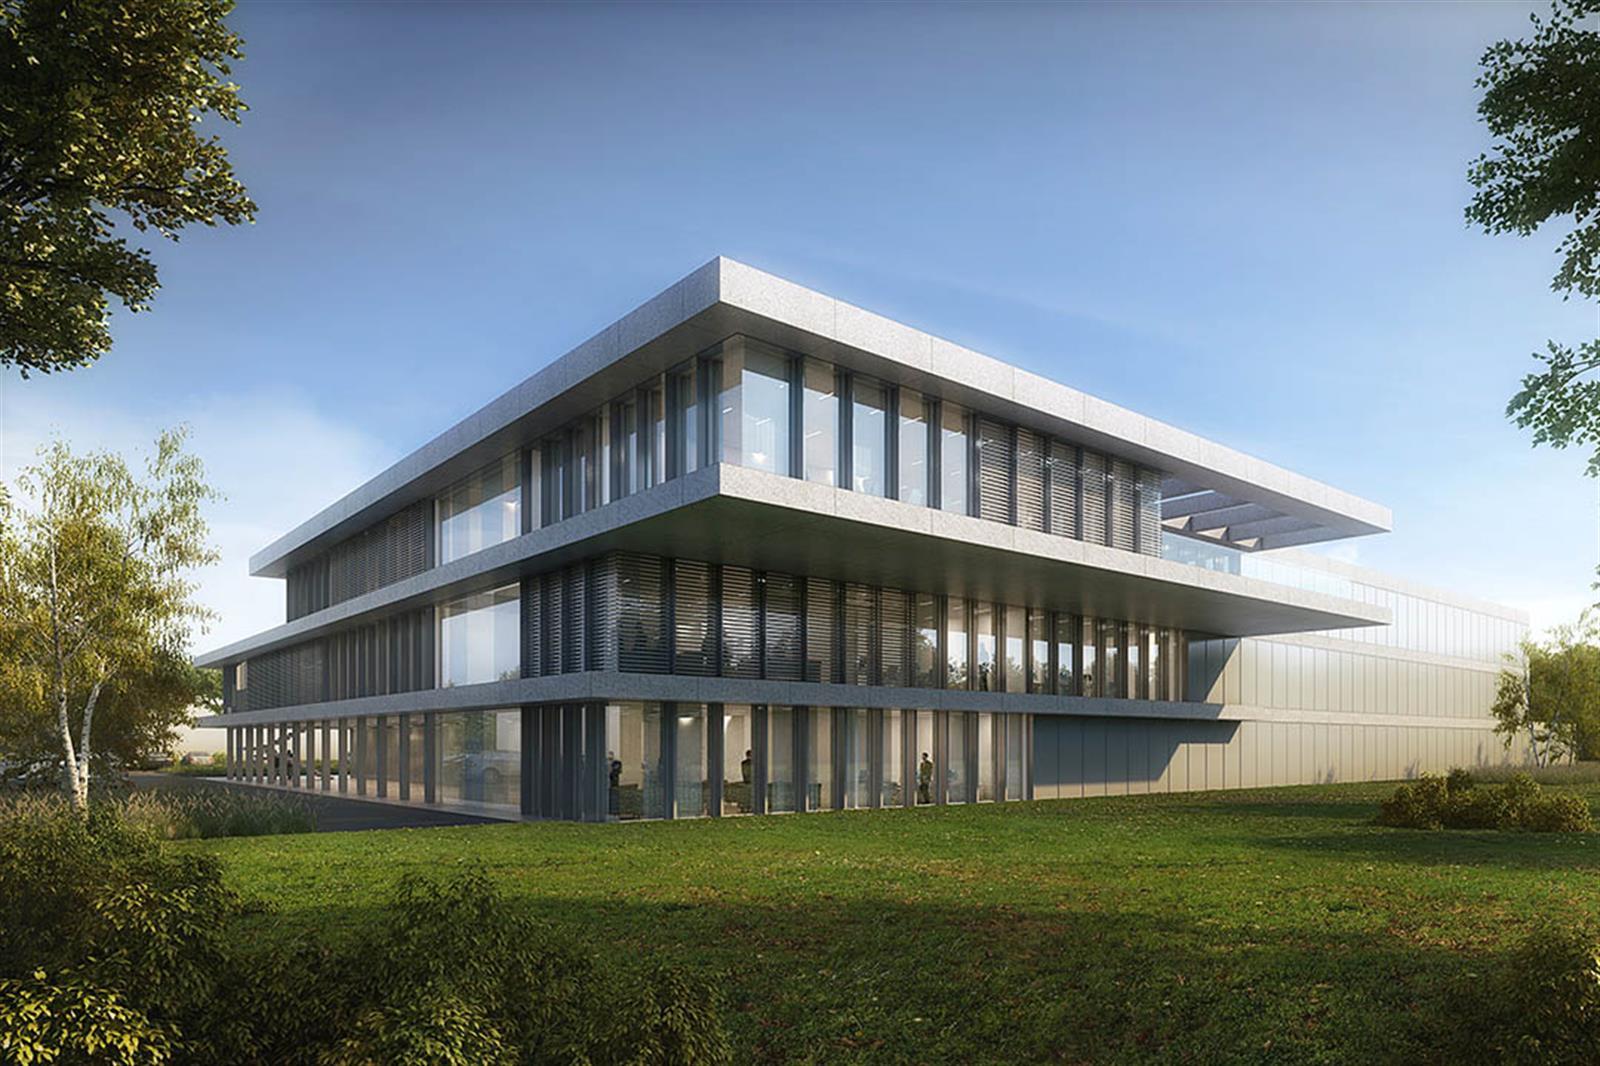 Moreno architecture associ s architecte design de for Reputation meubles concept